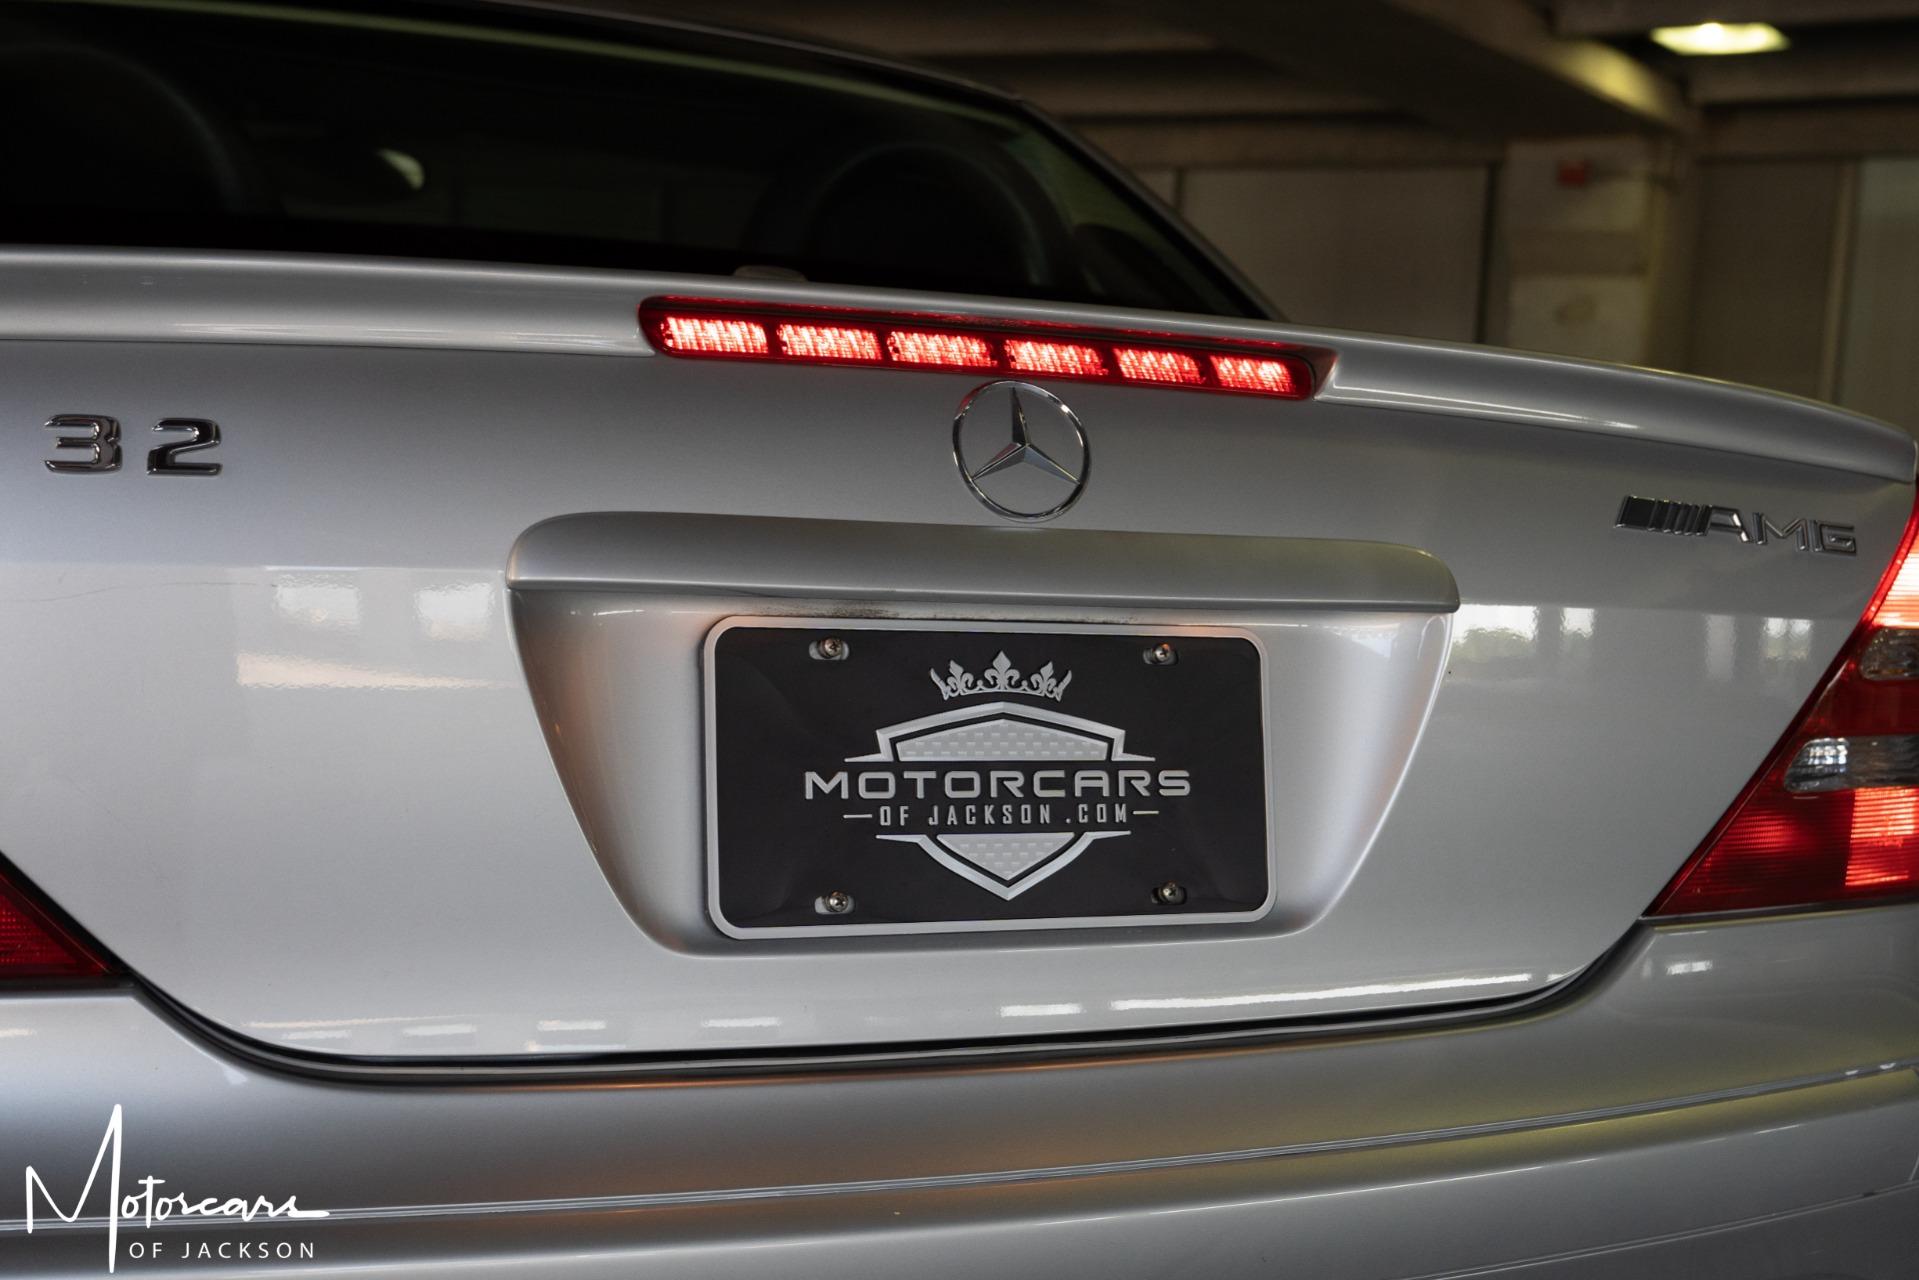 Used-2002-Mercedes-Benz-SLK-Class-32L-AMG-Jackson-MS